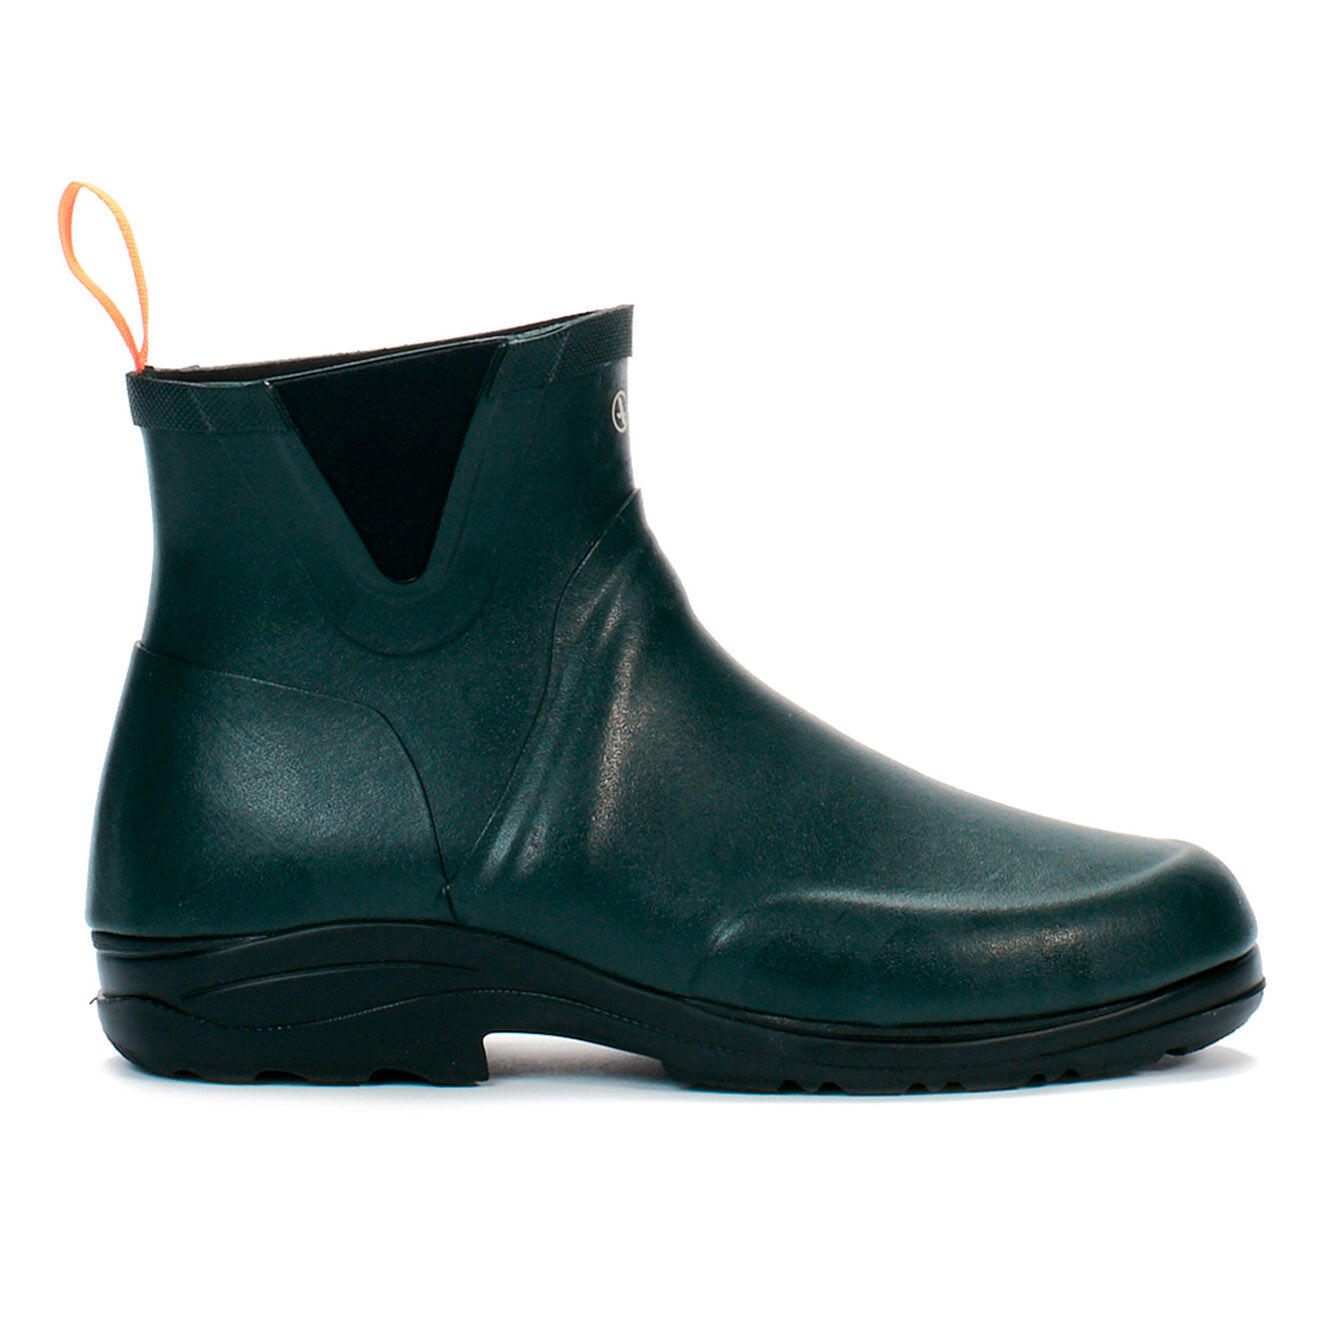 Boots Daintree vertes - Aigle - Modalova